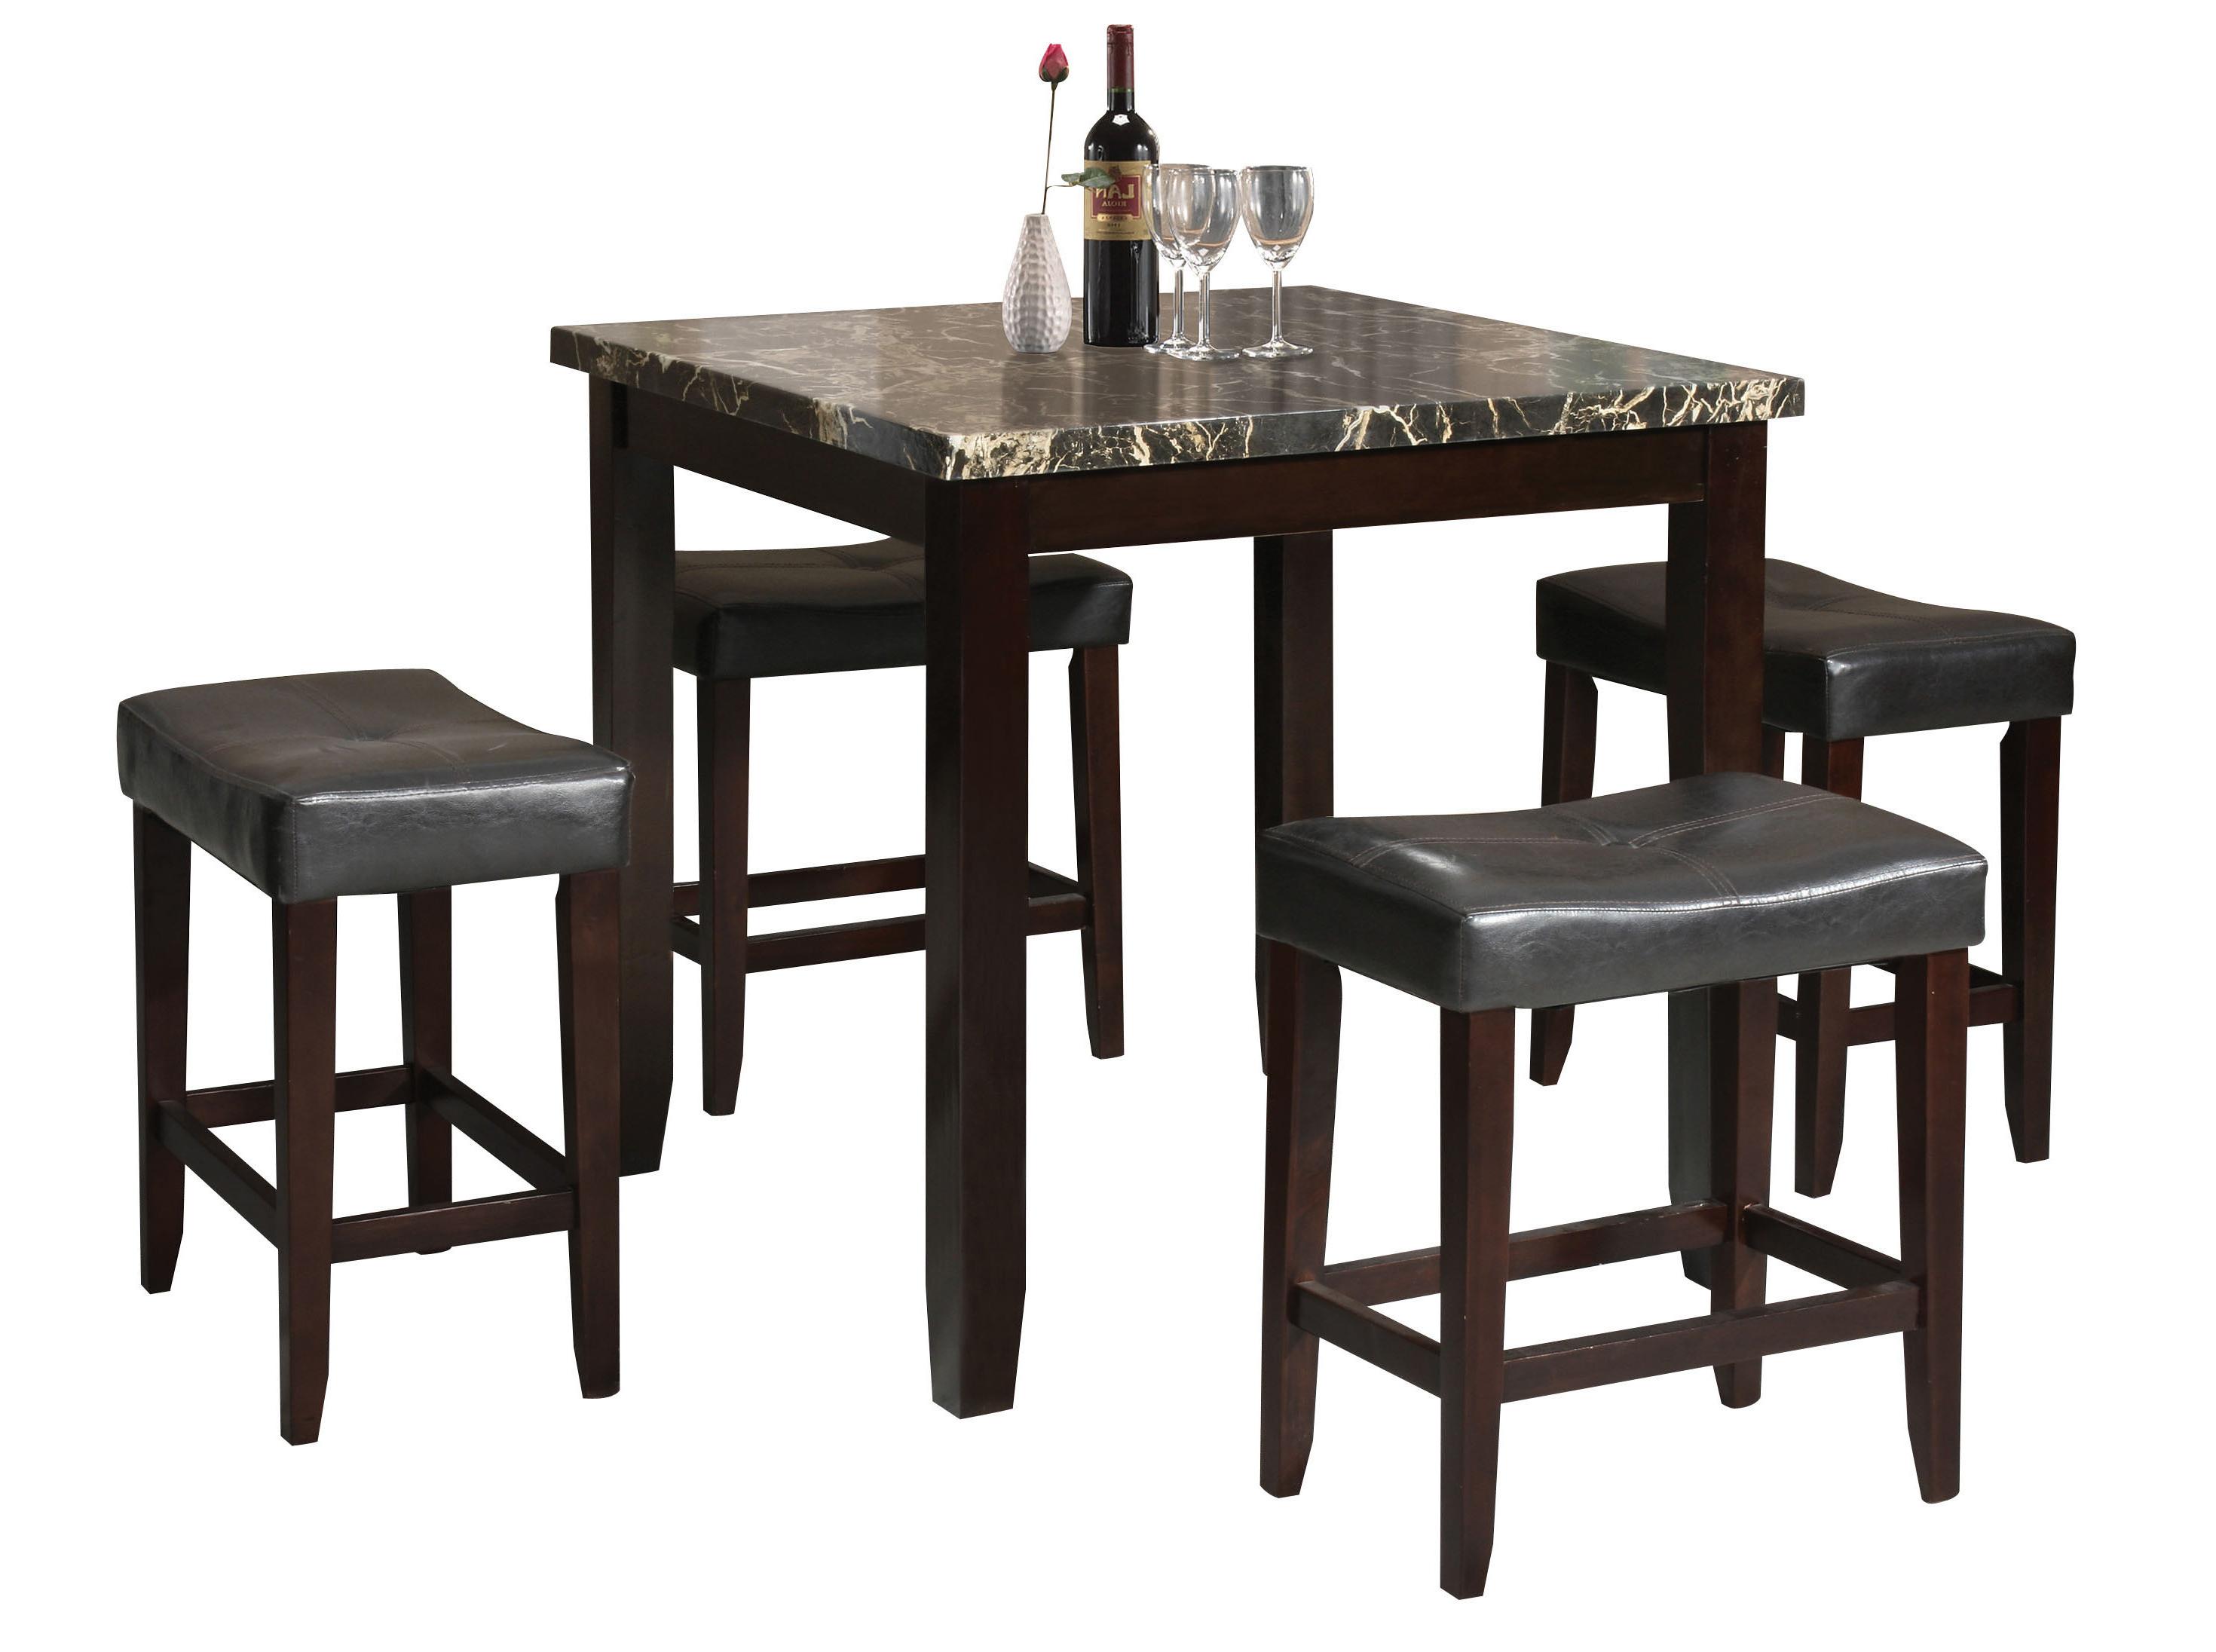 Sheetz 3 Piece Counter Height Dining Sets Regarding 2018 Dehaven 5 Piece Counter Height Dining Set (View 15 of 20)